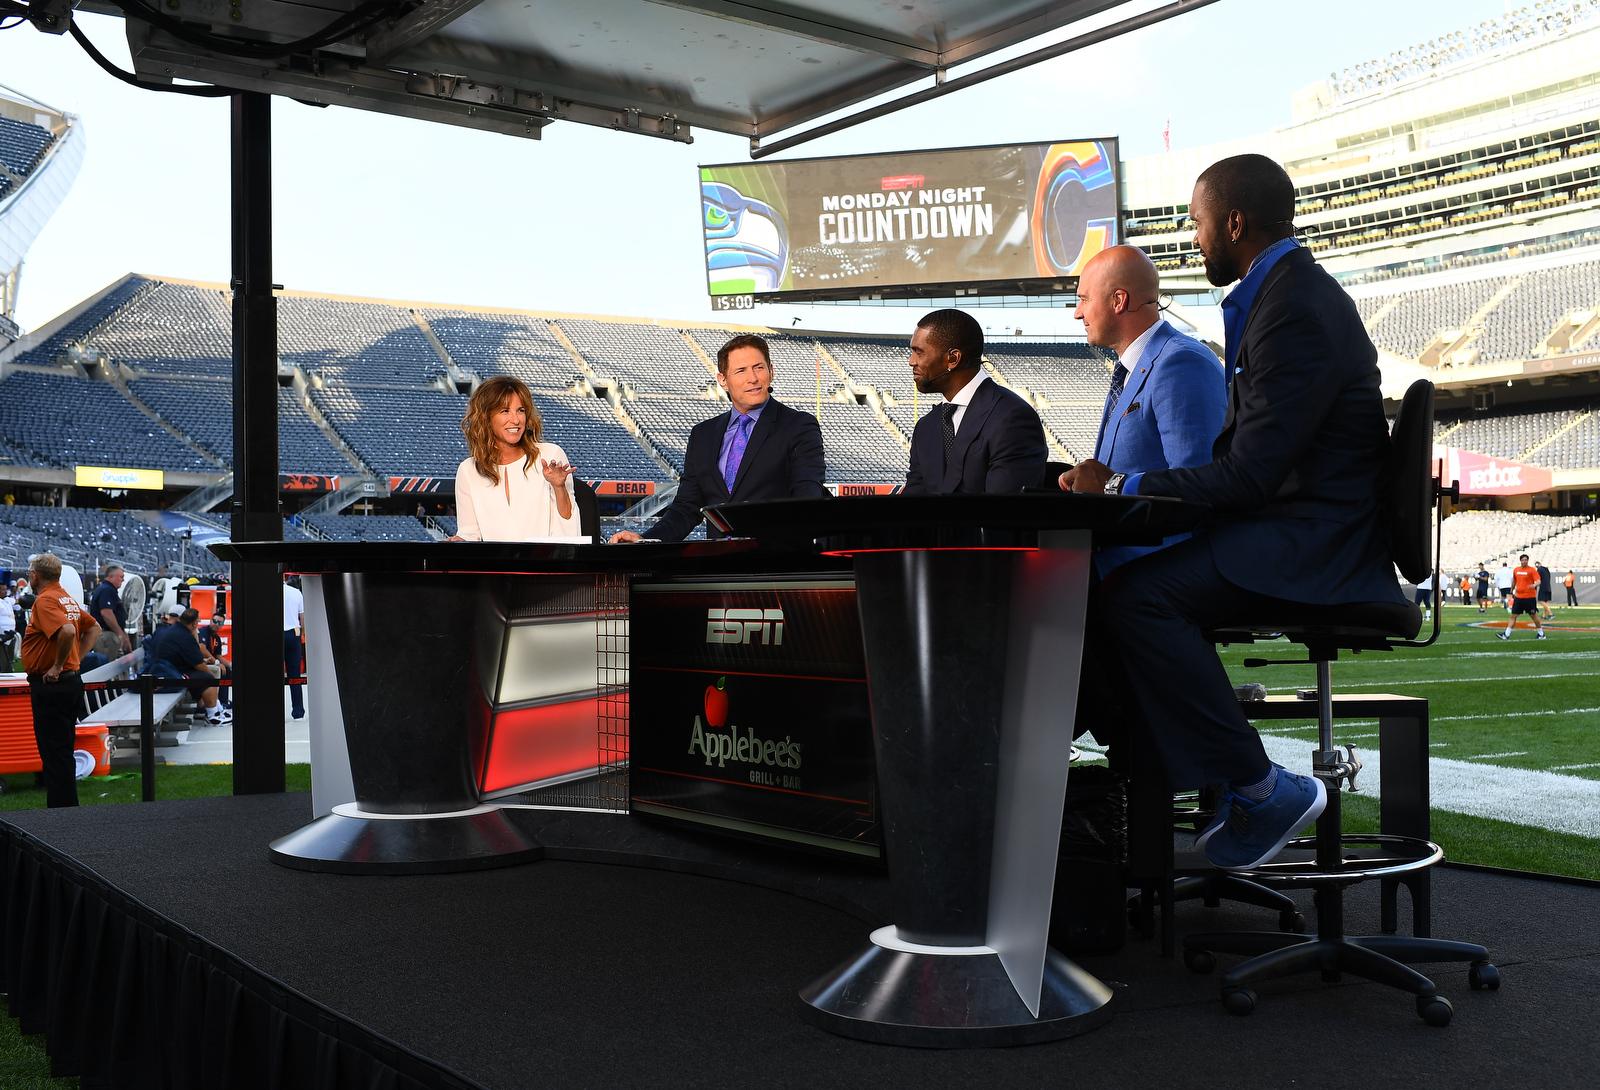 NCS_ESPN-NFL-Monday-Night-Countdown-0011